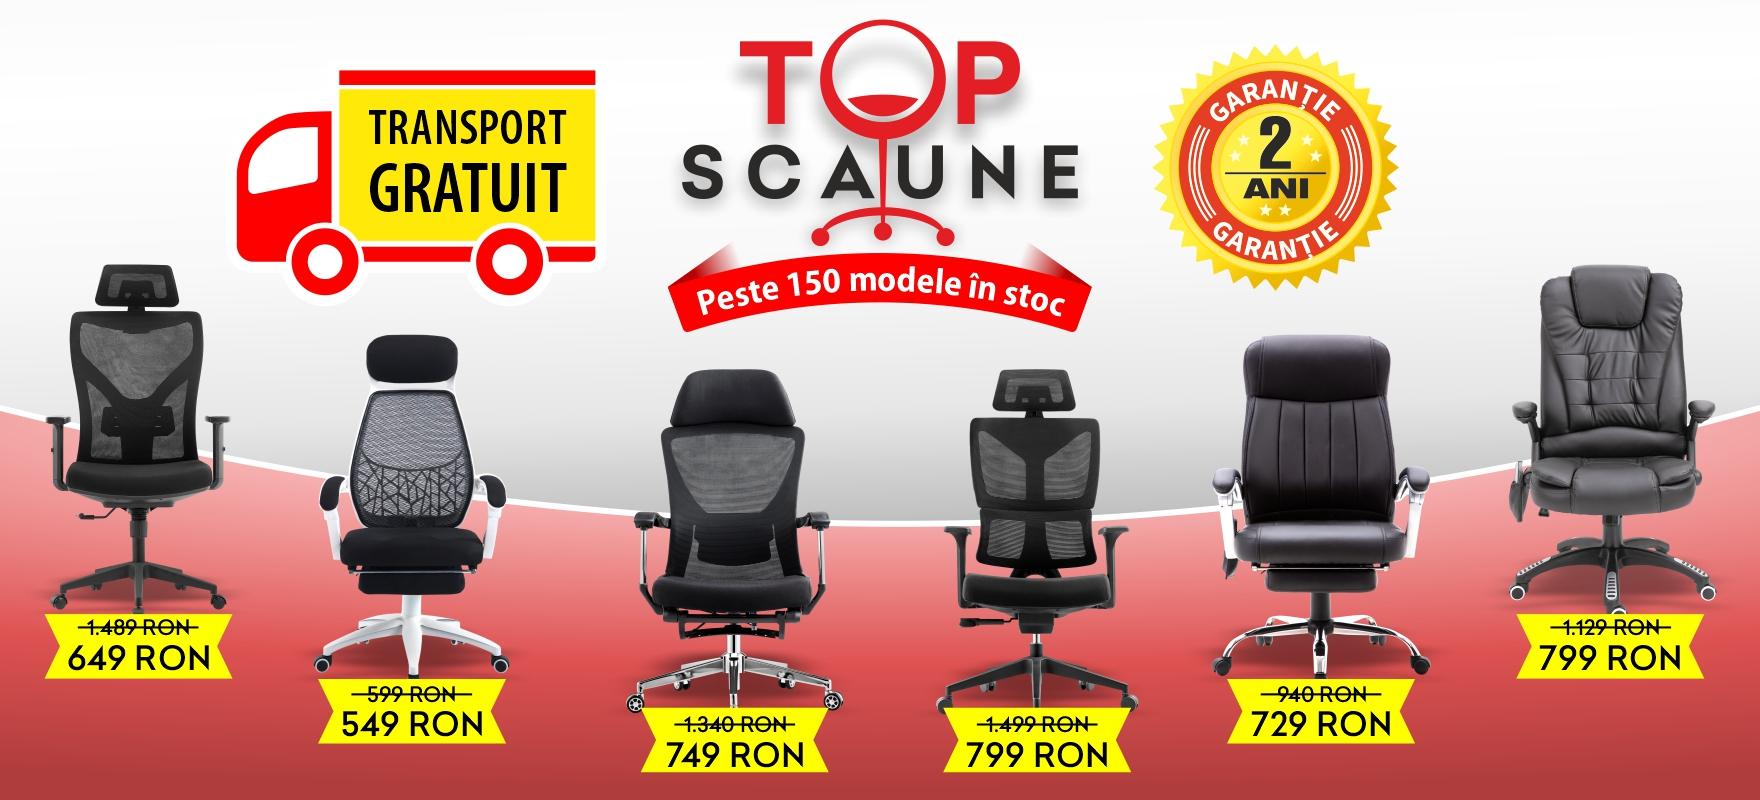 topscaune banner site 202104 2 - TopScaune: Magazin Online de Scaune